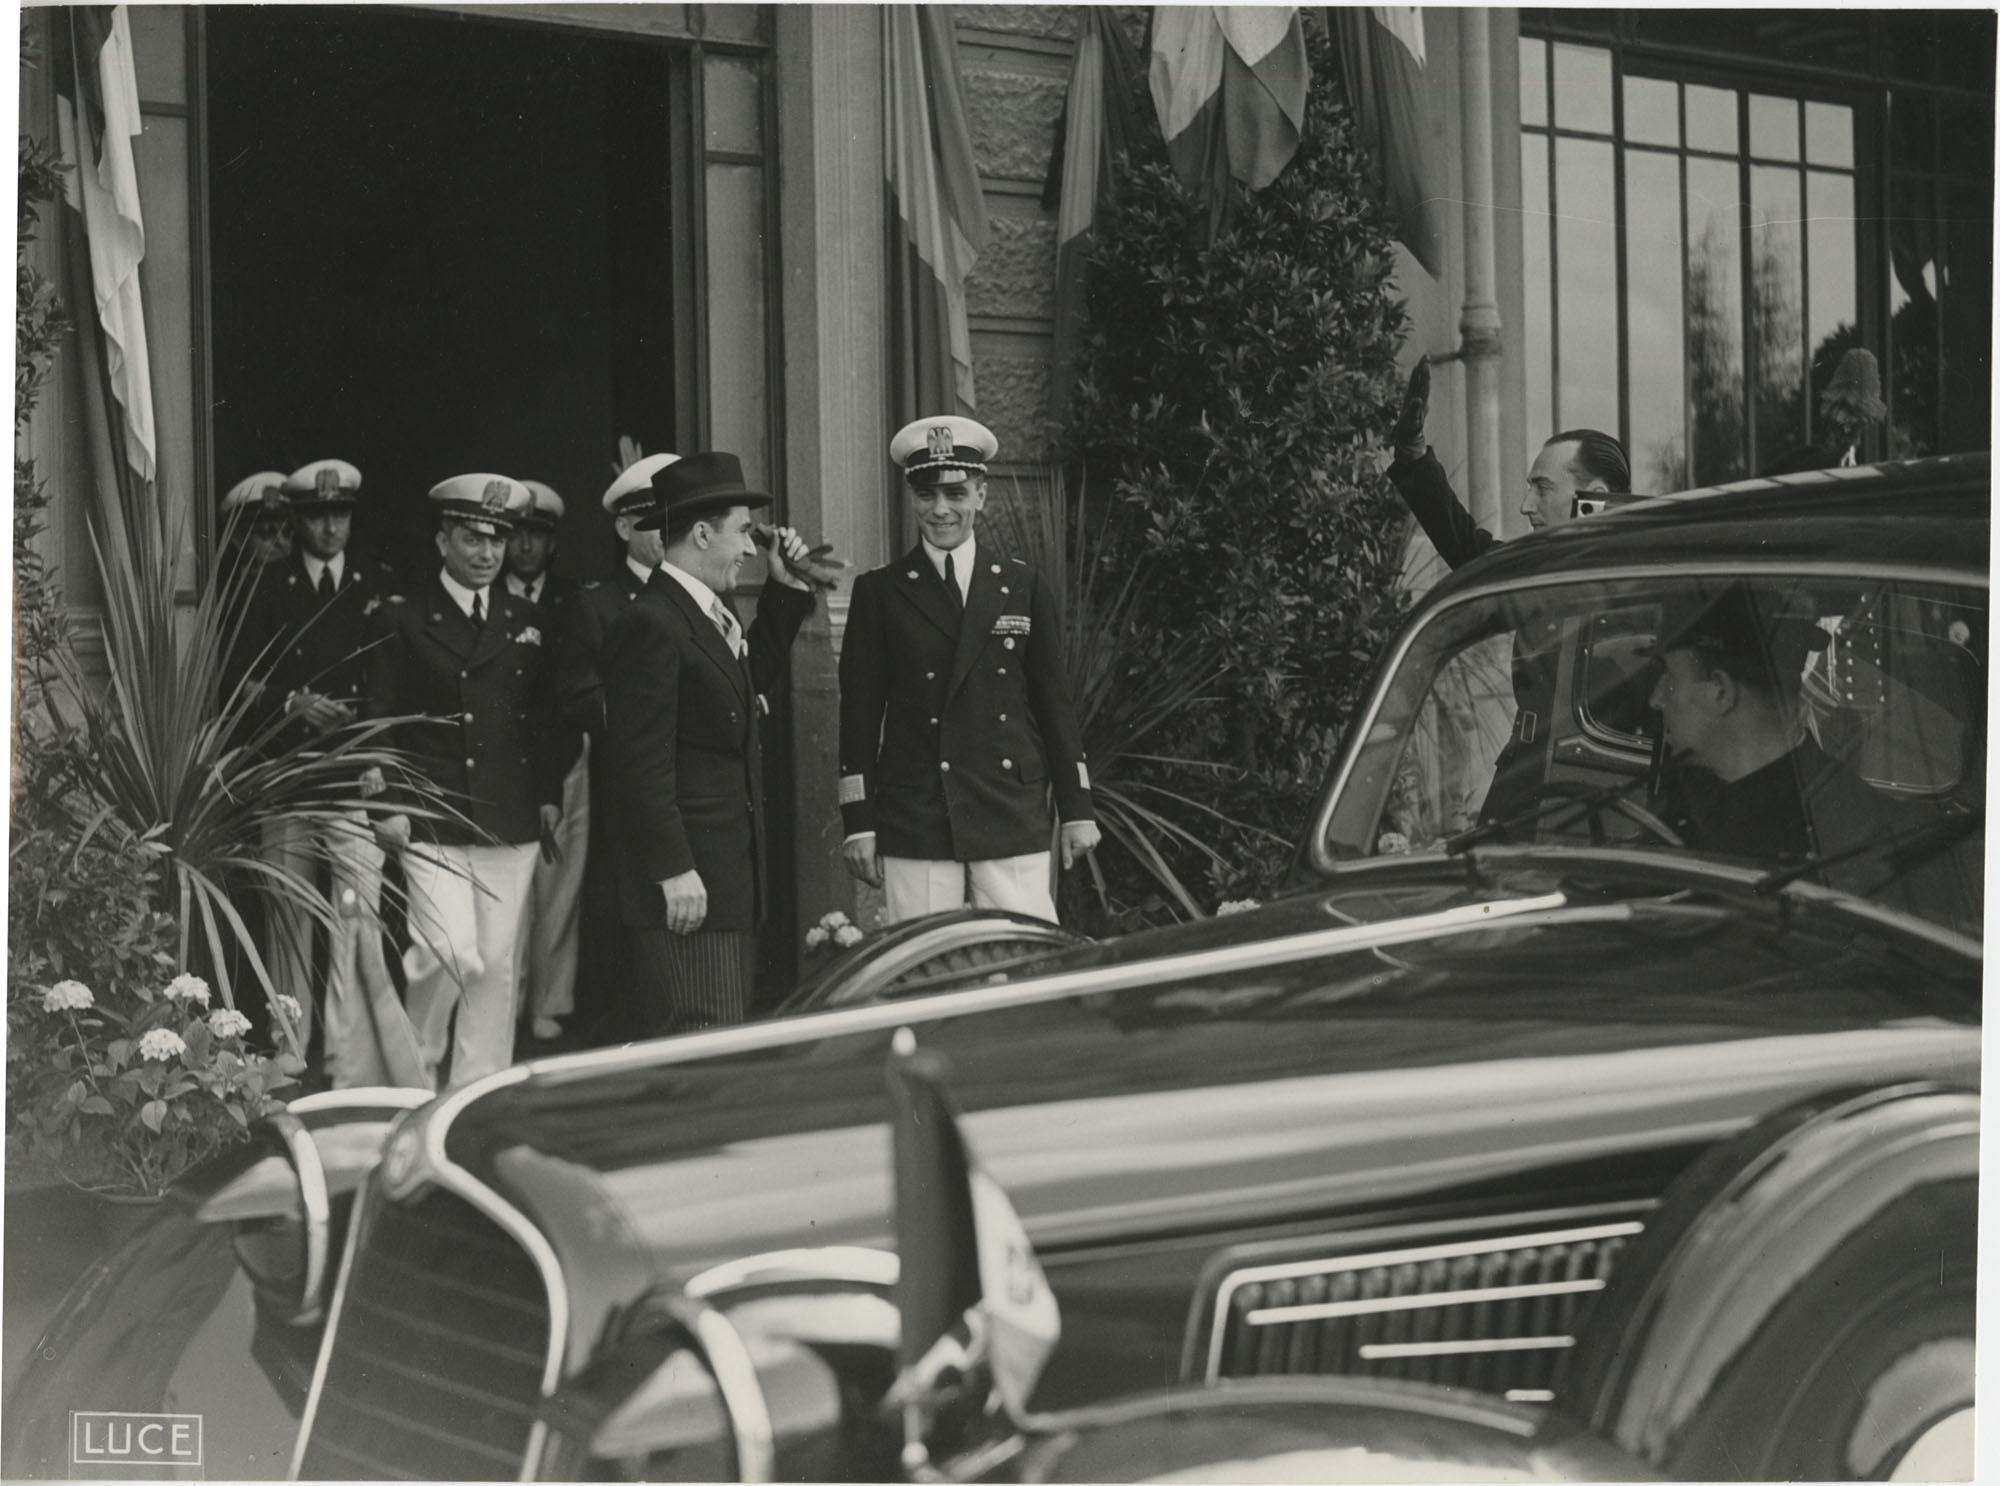 Mihai Antonescu's visit to Benito Mussolini, Photograph 31